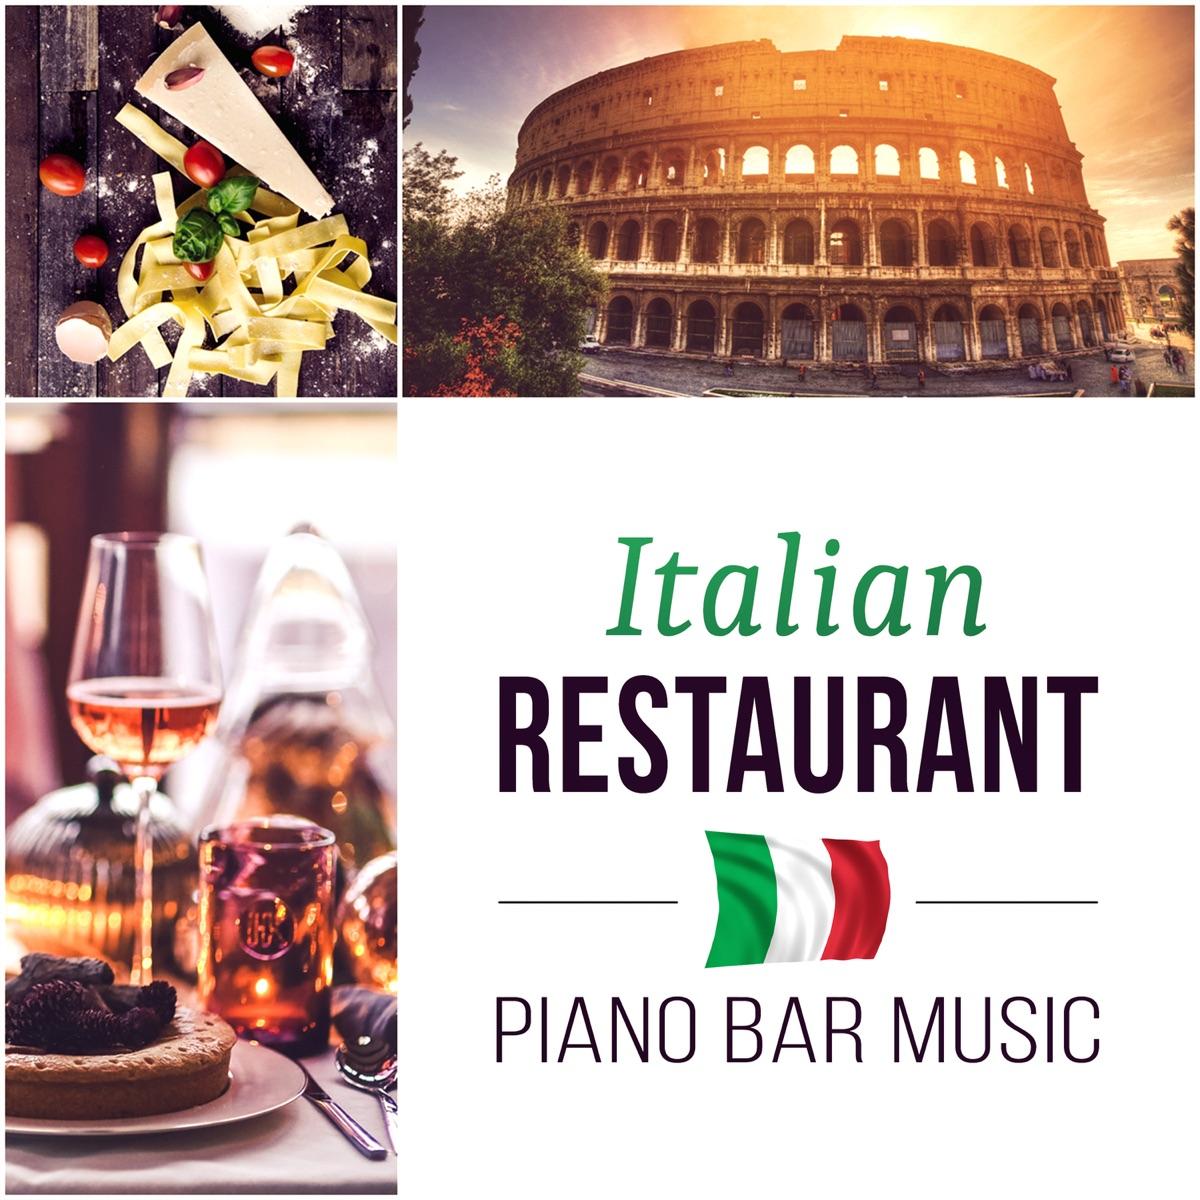 Italian Restaurant - Piano Bar Music, Smooth Jazz for Romantic ...